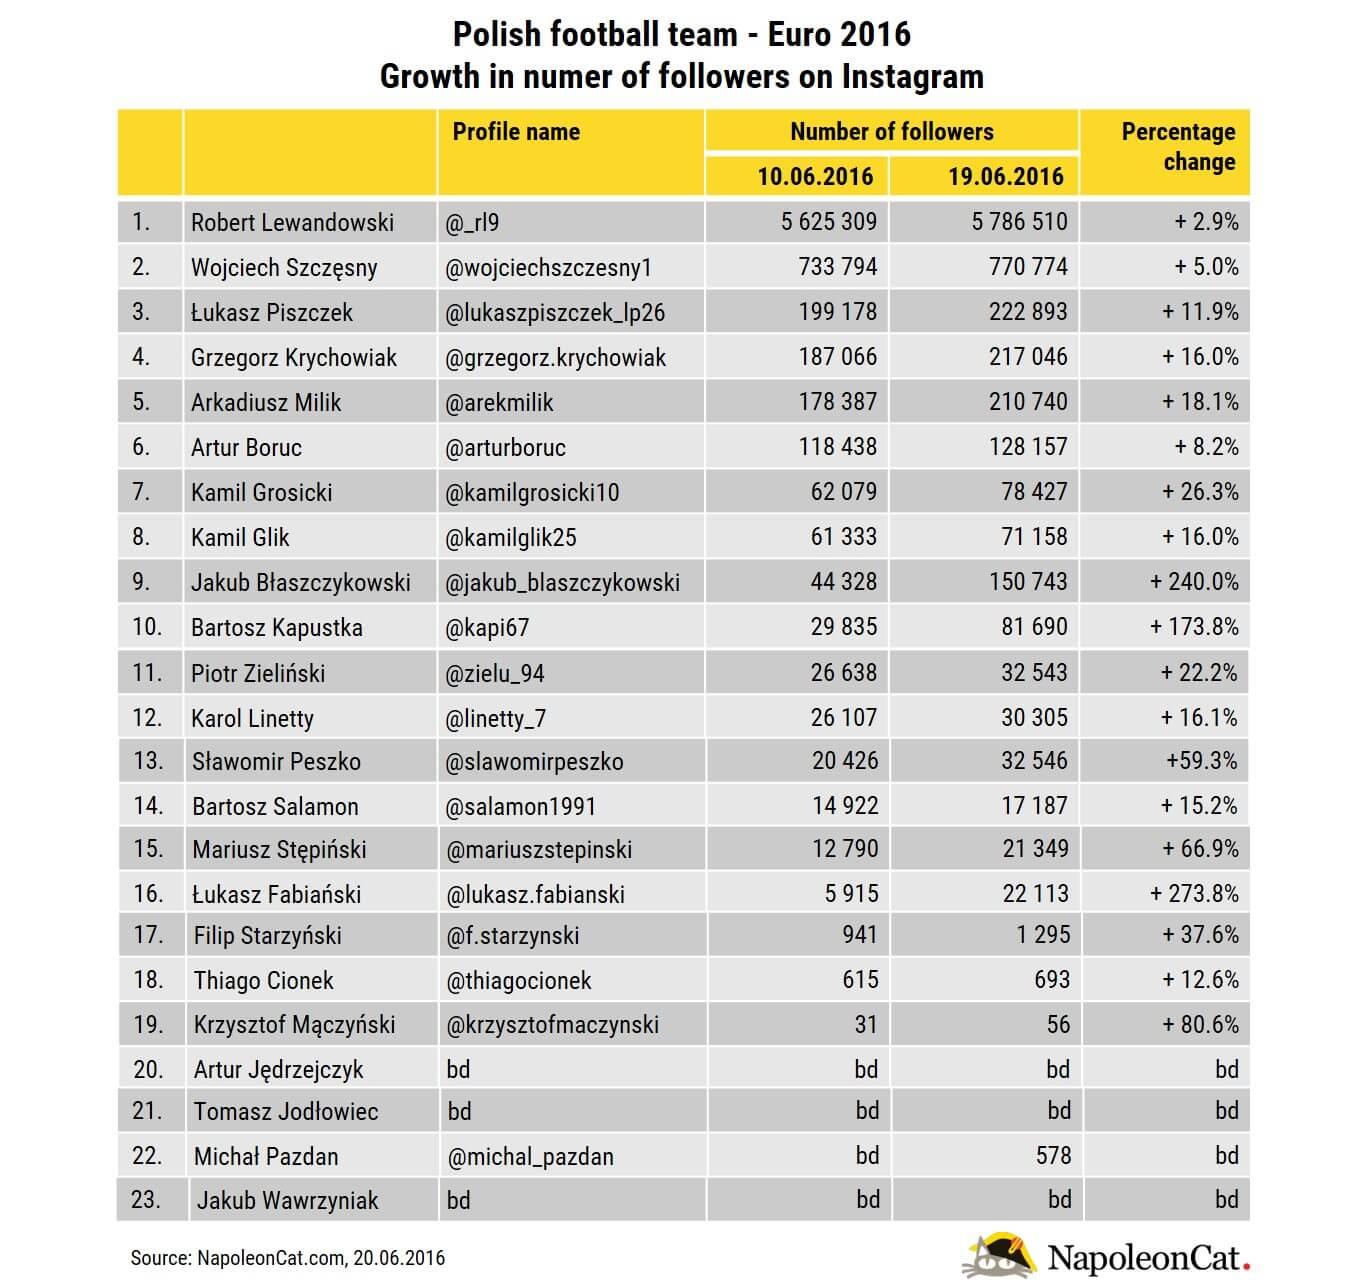 polish football team Euro 2016_growth of followers on Instagram_NapoleonCat.com_table